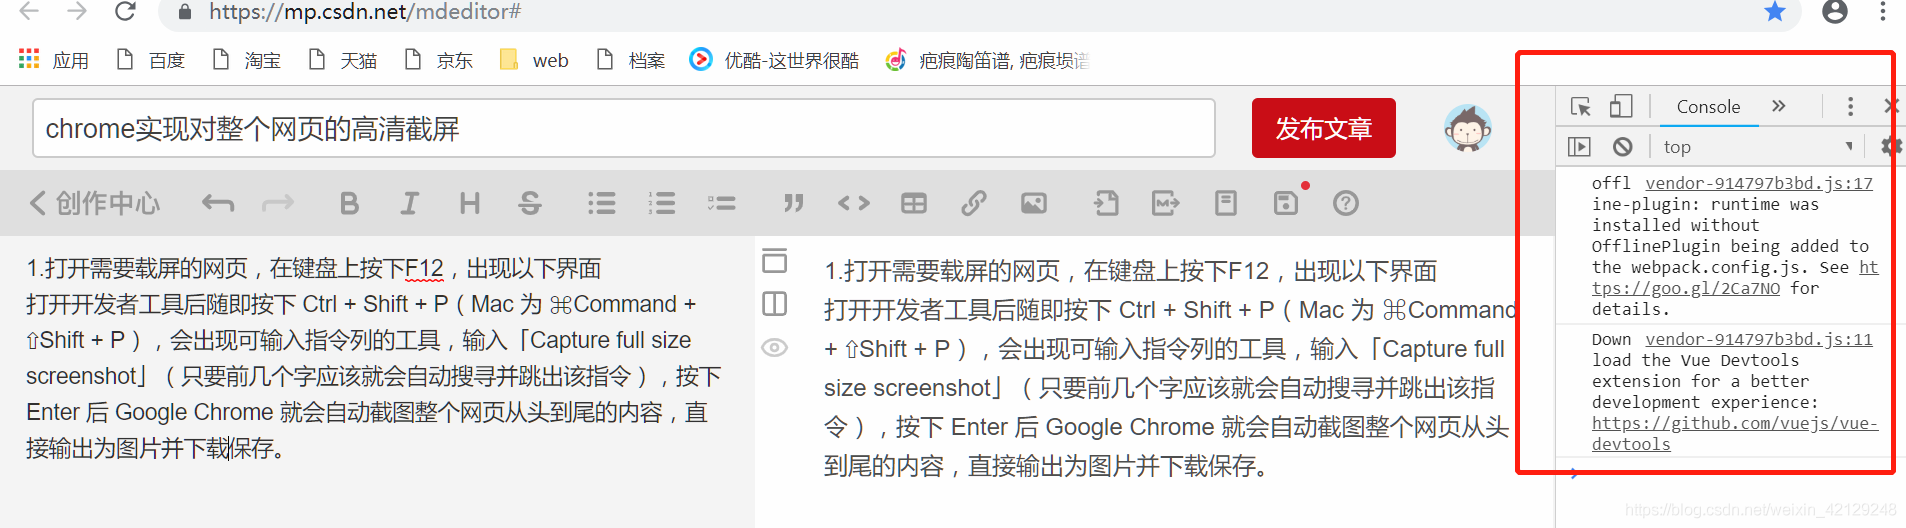 F12实现对整个网页的高清截屏—shift+ctrl+p、capture